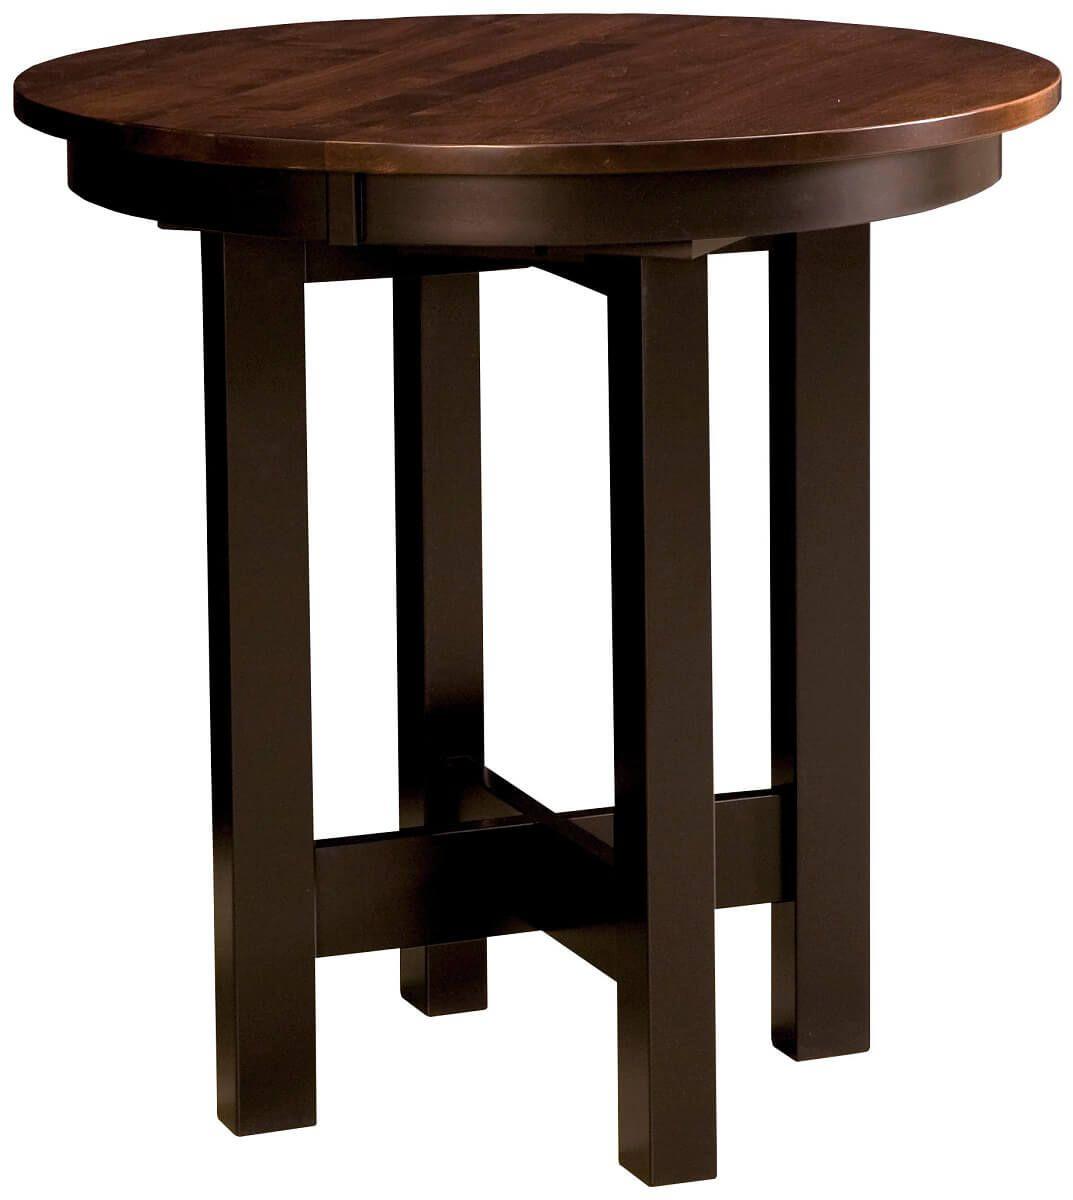 La Rambla Pub Table